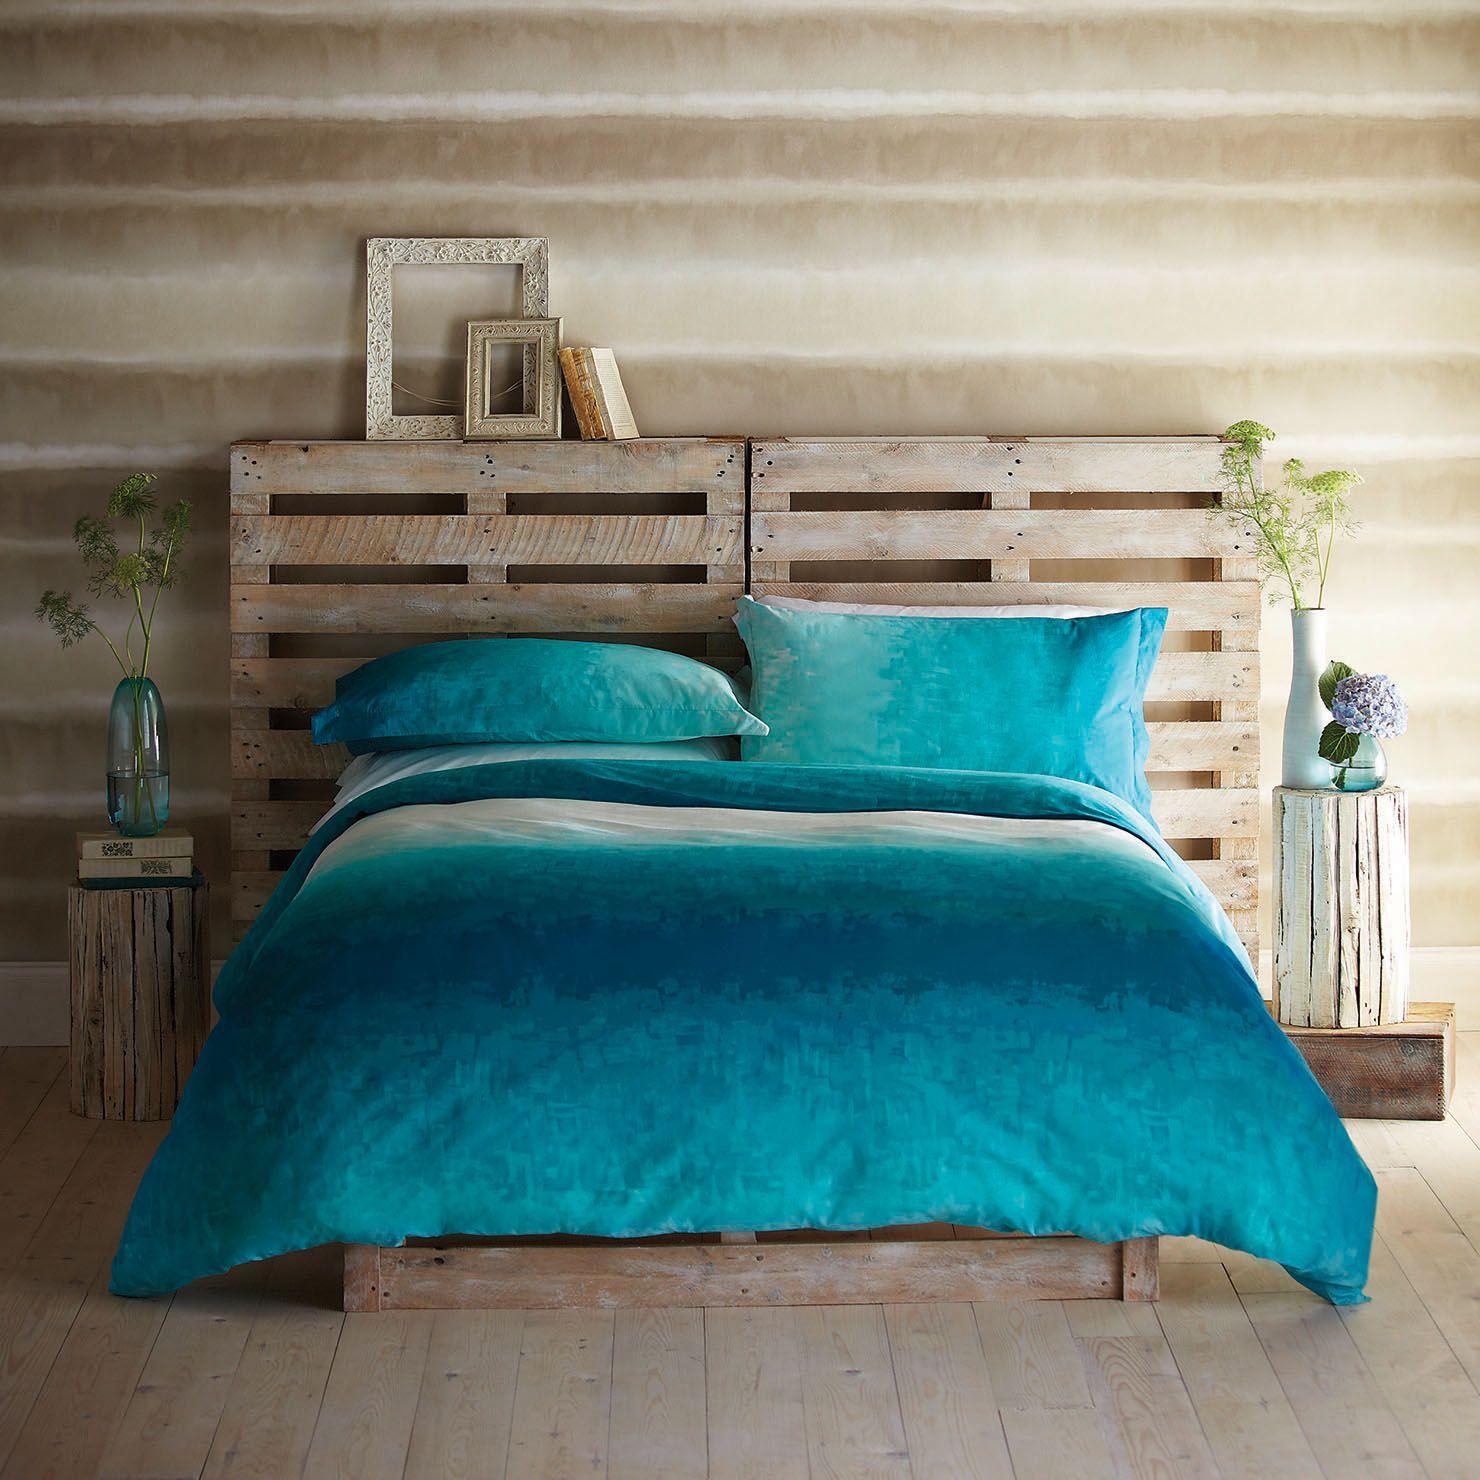 Pallet Headboard :) | What I Like | Pinterest | Palets, Dormitorio y ...